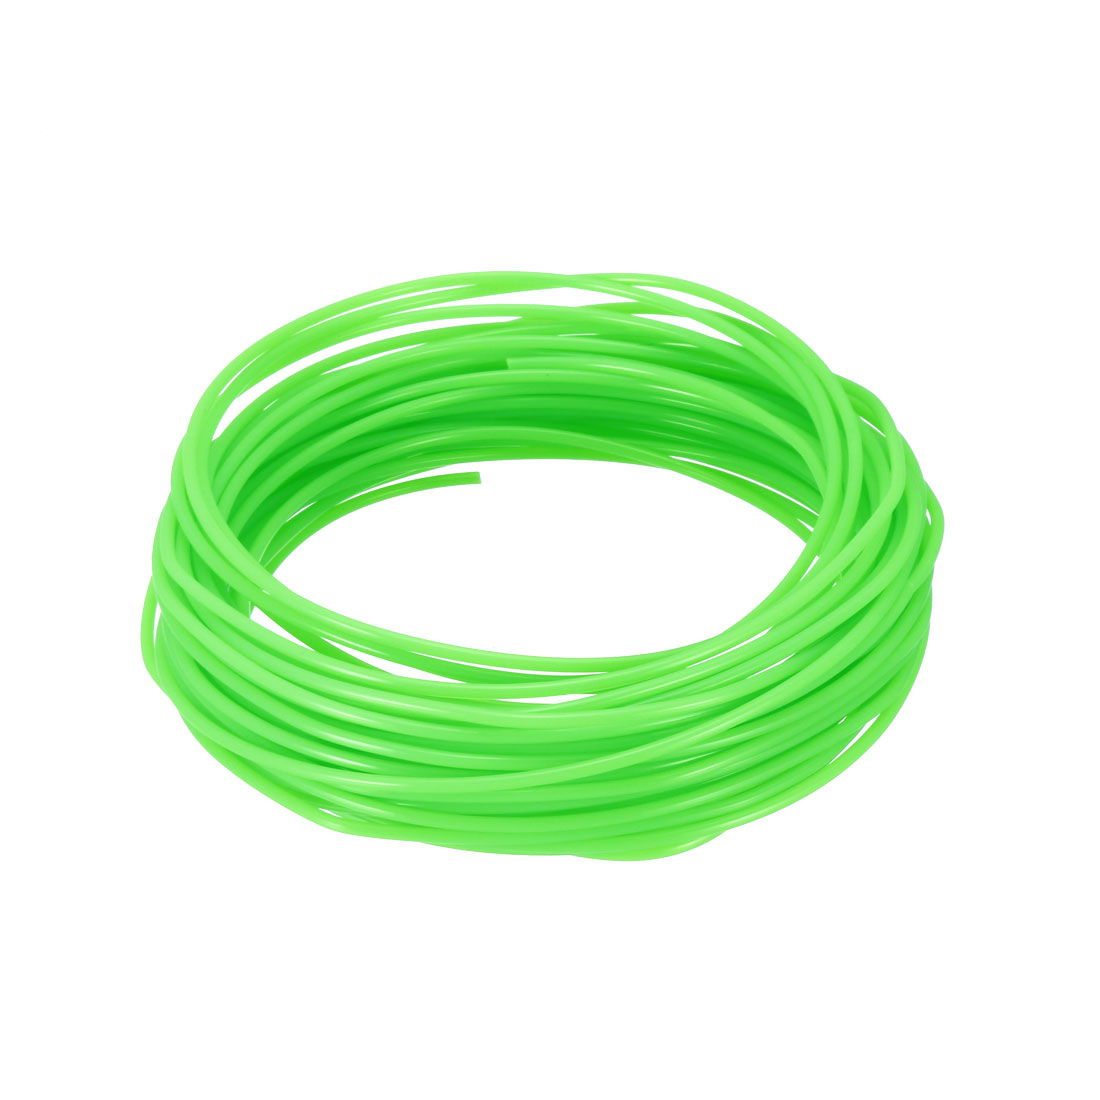 10 Meter/32.5 Ft PLA 3D Pen/3D Printer Filament, 1.75 mm Fluorescent Green